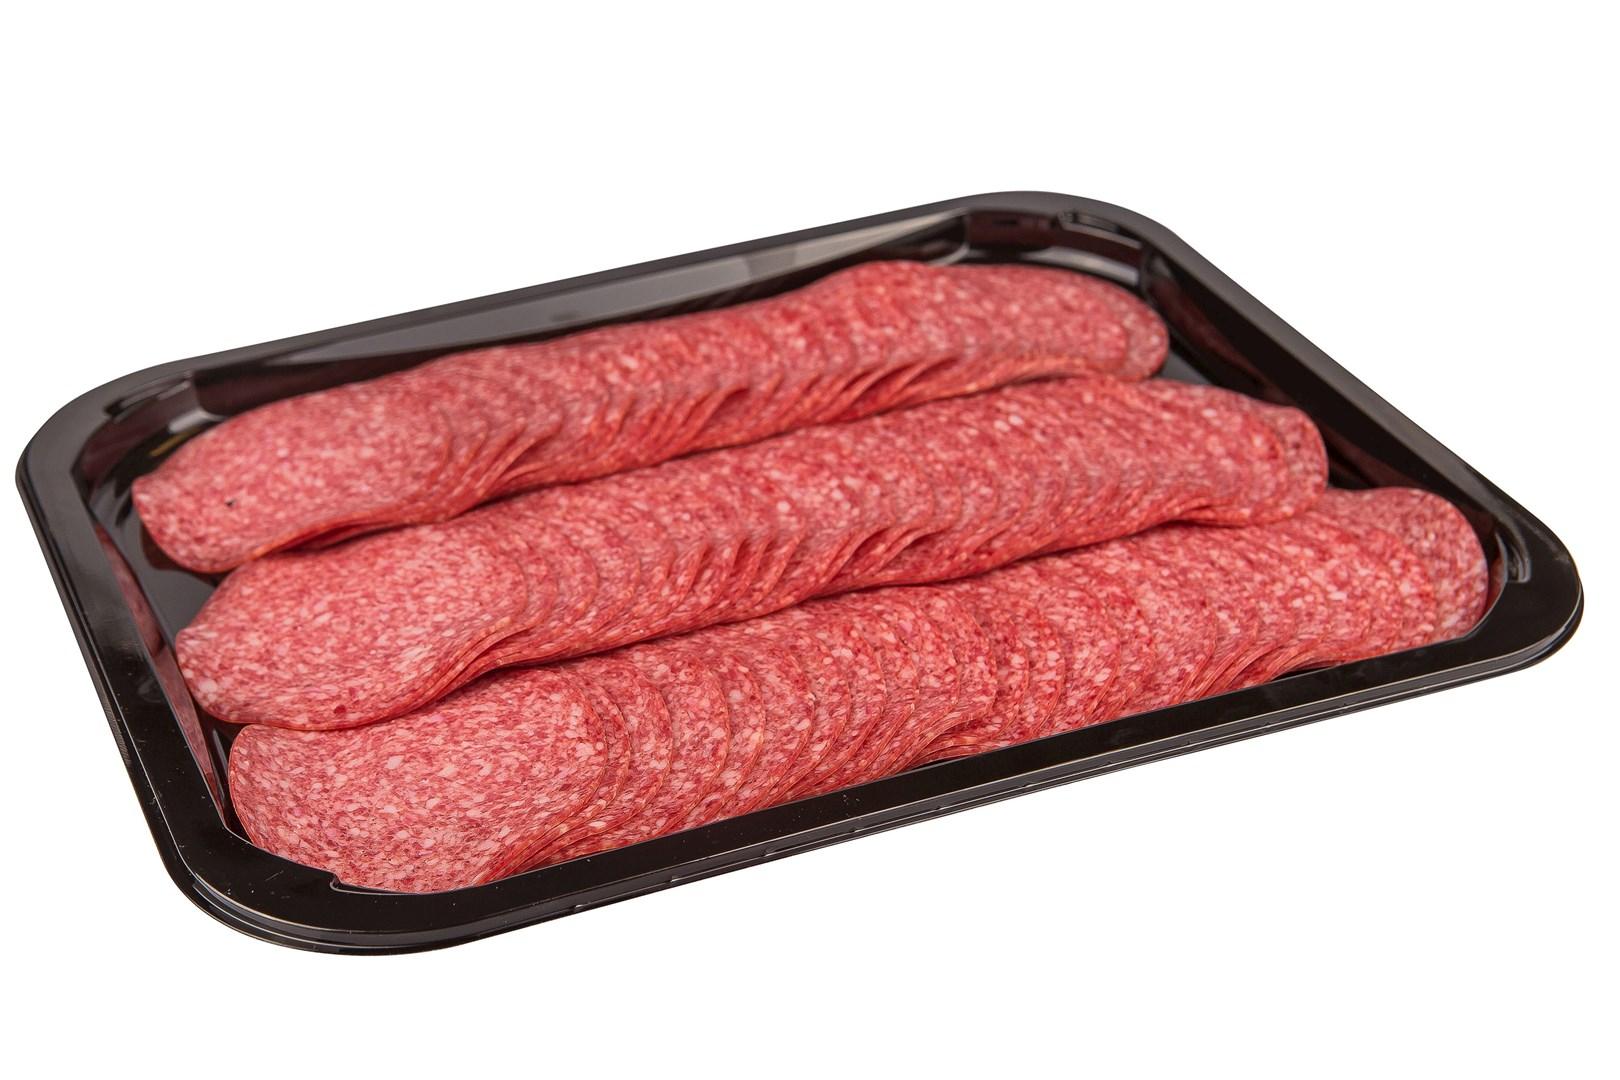 Productafbeelding Salami op stapel dik 1.5 mm 1 kg